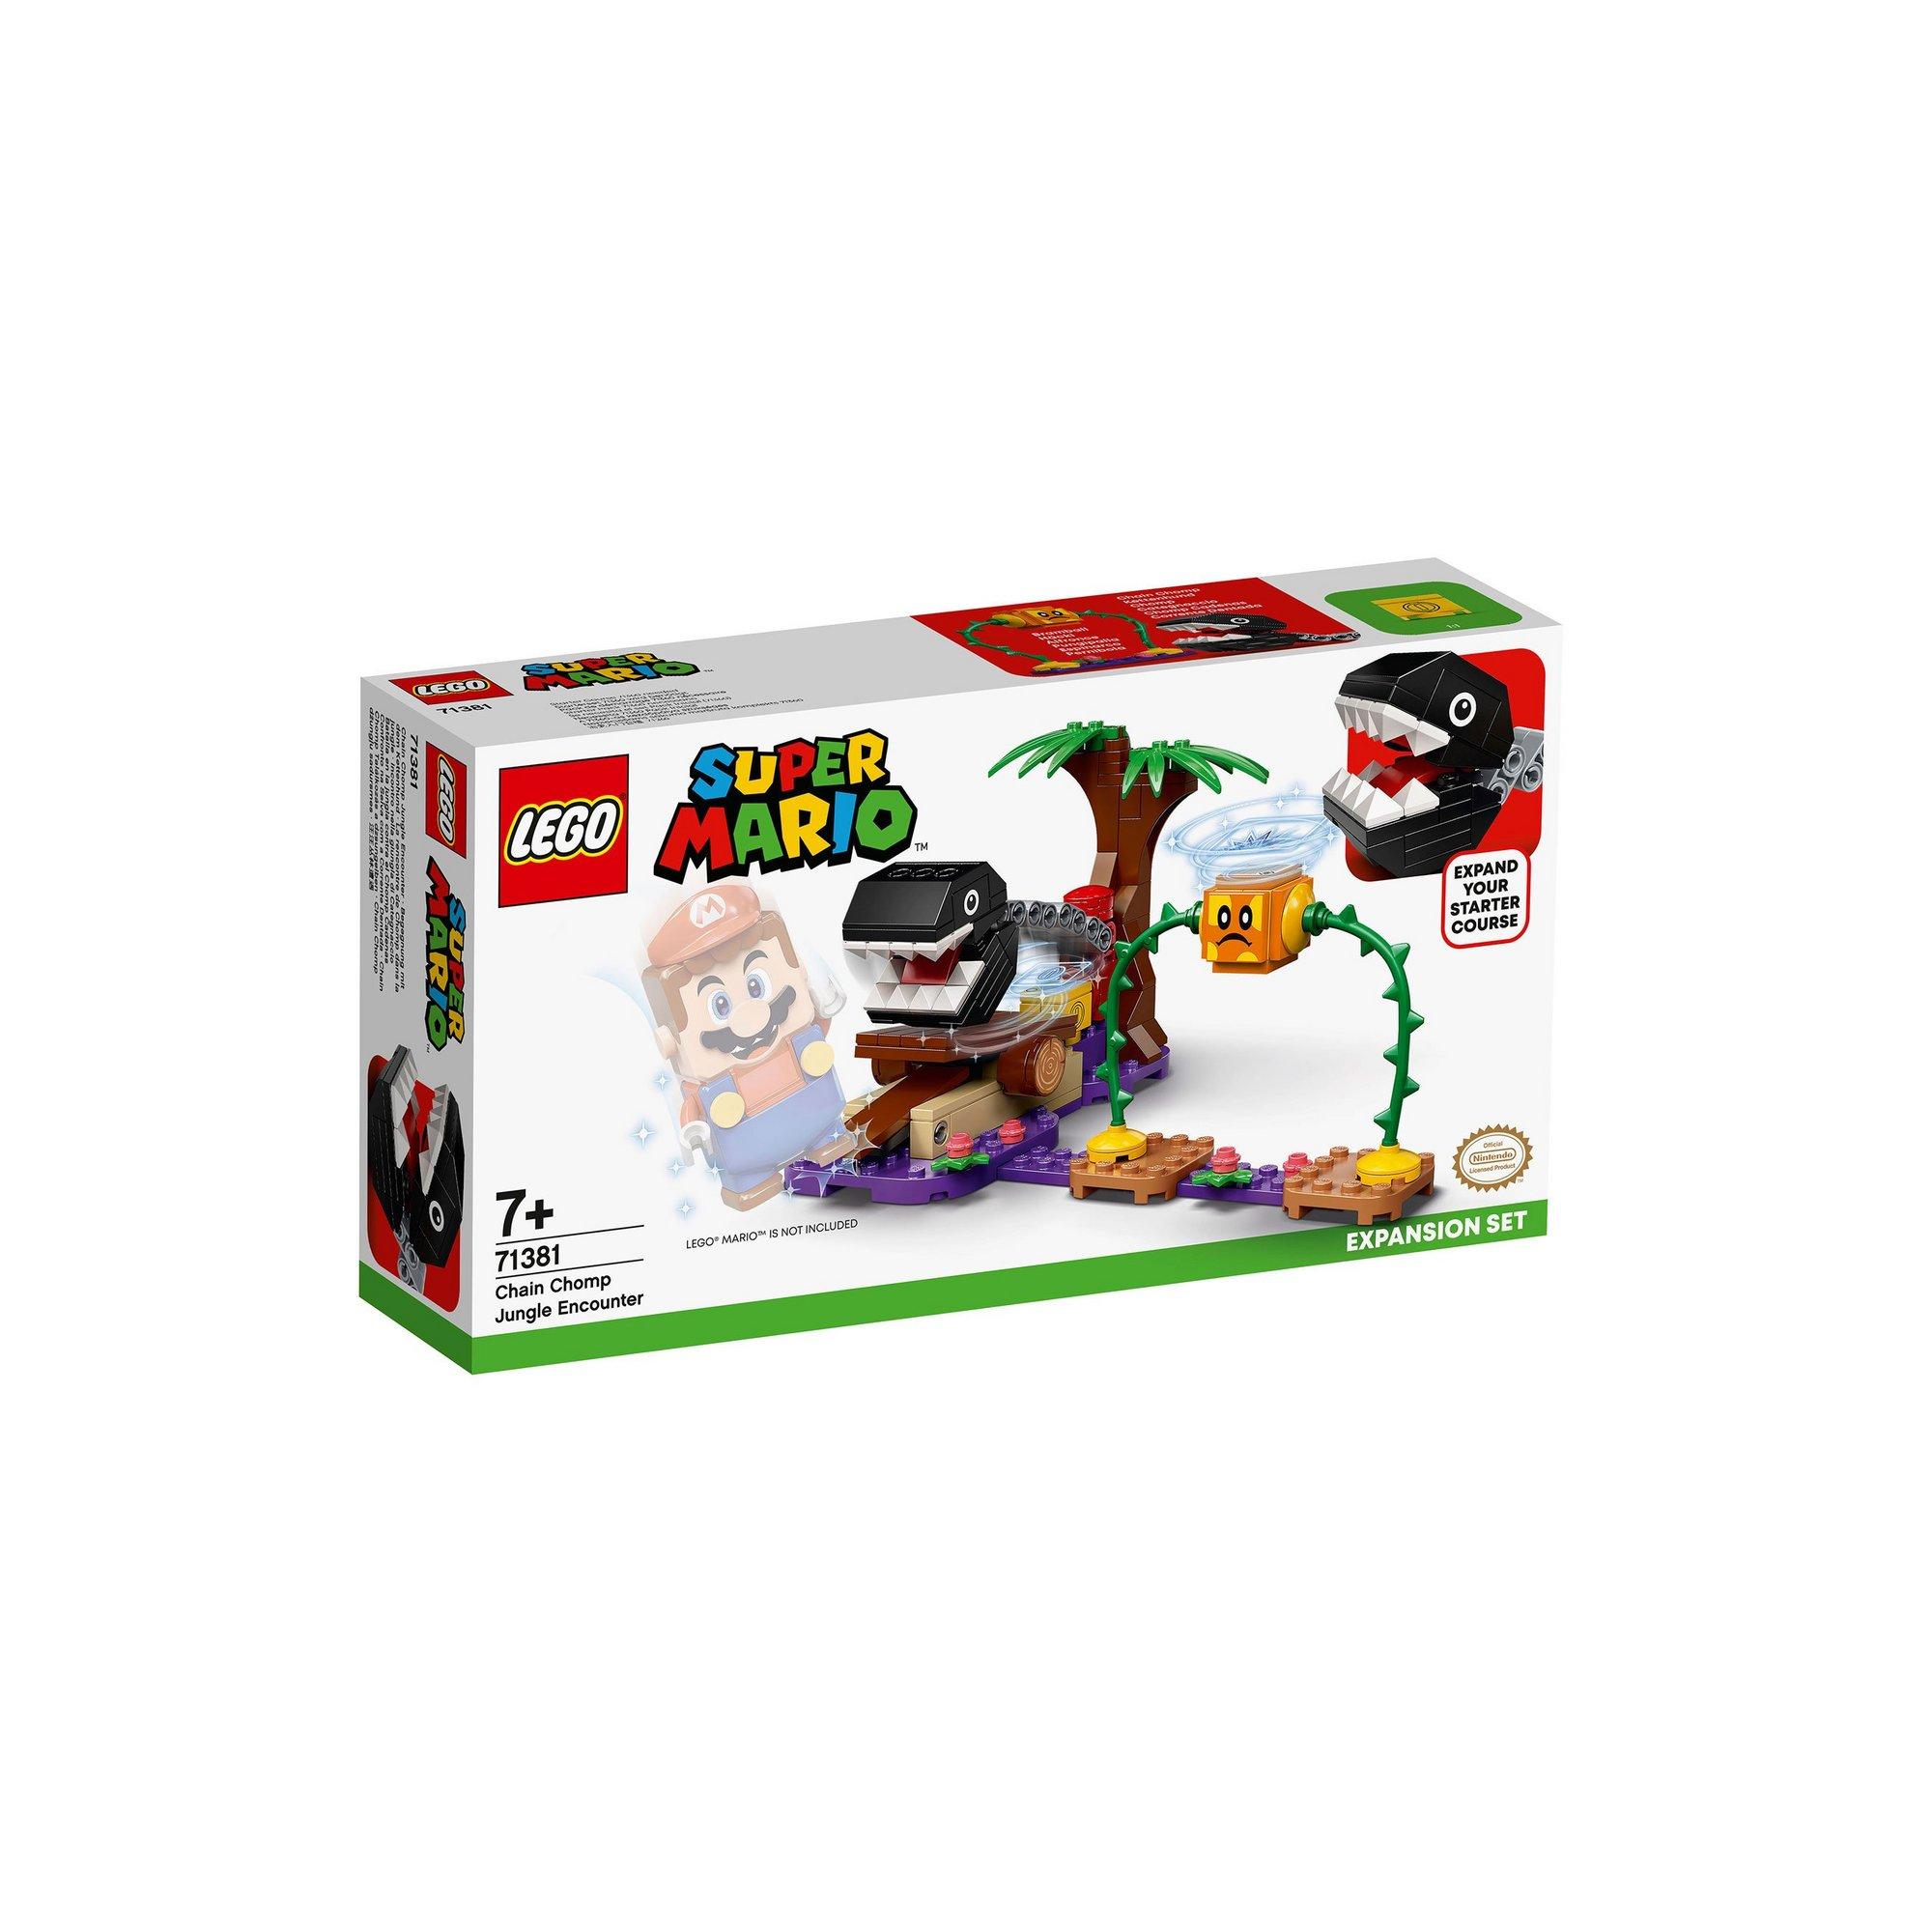 Image of LEGO Super Mario Chain Chomp Jungle Encounter